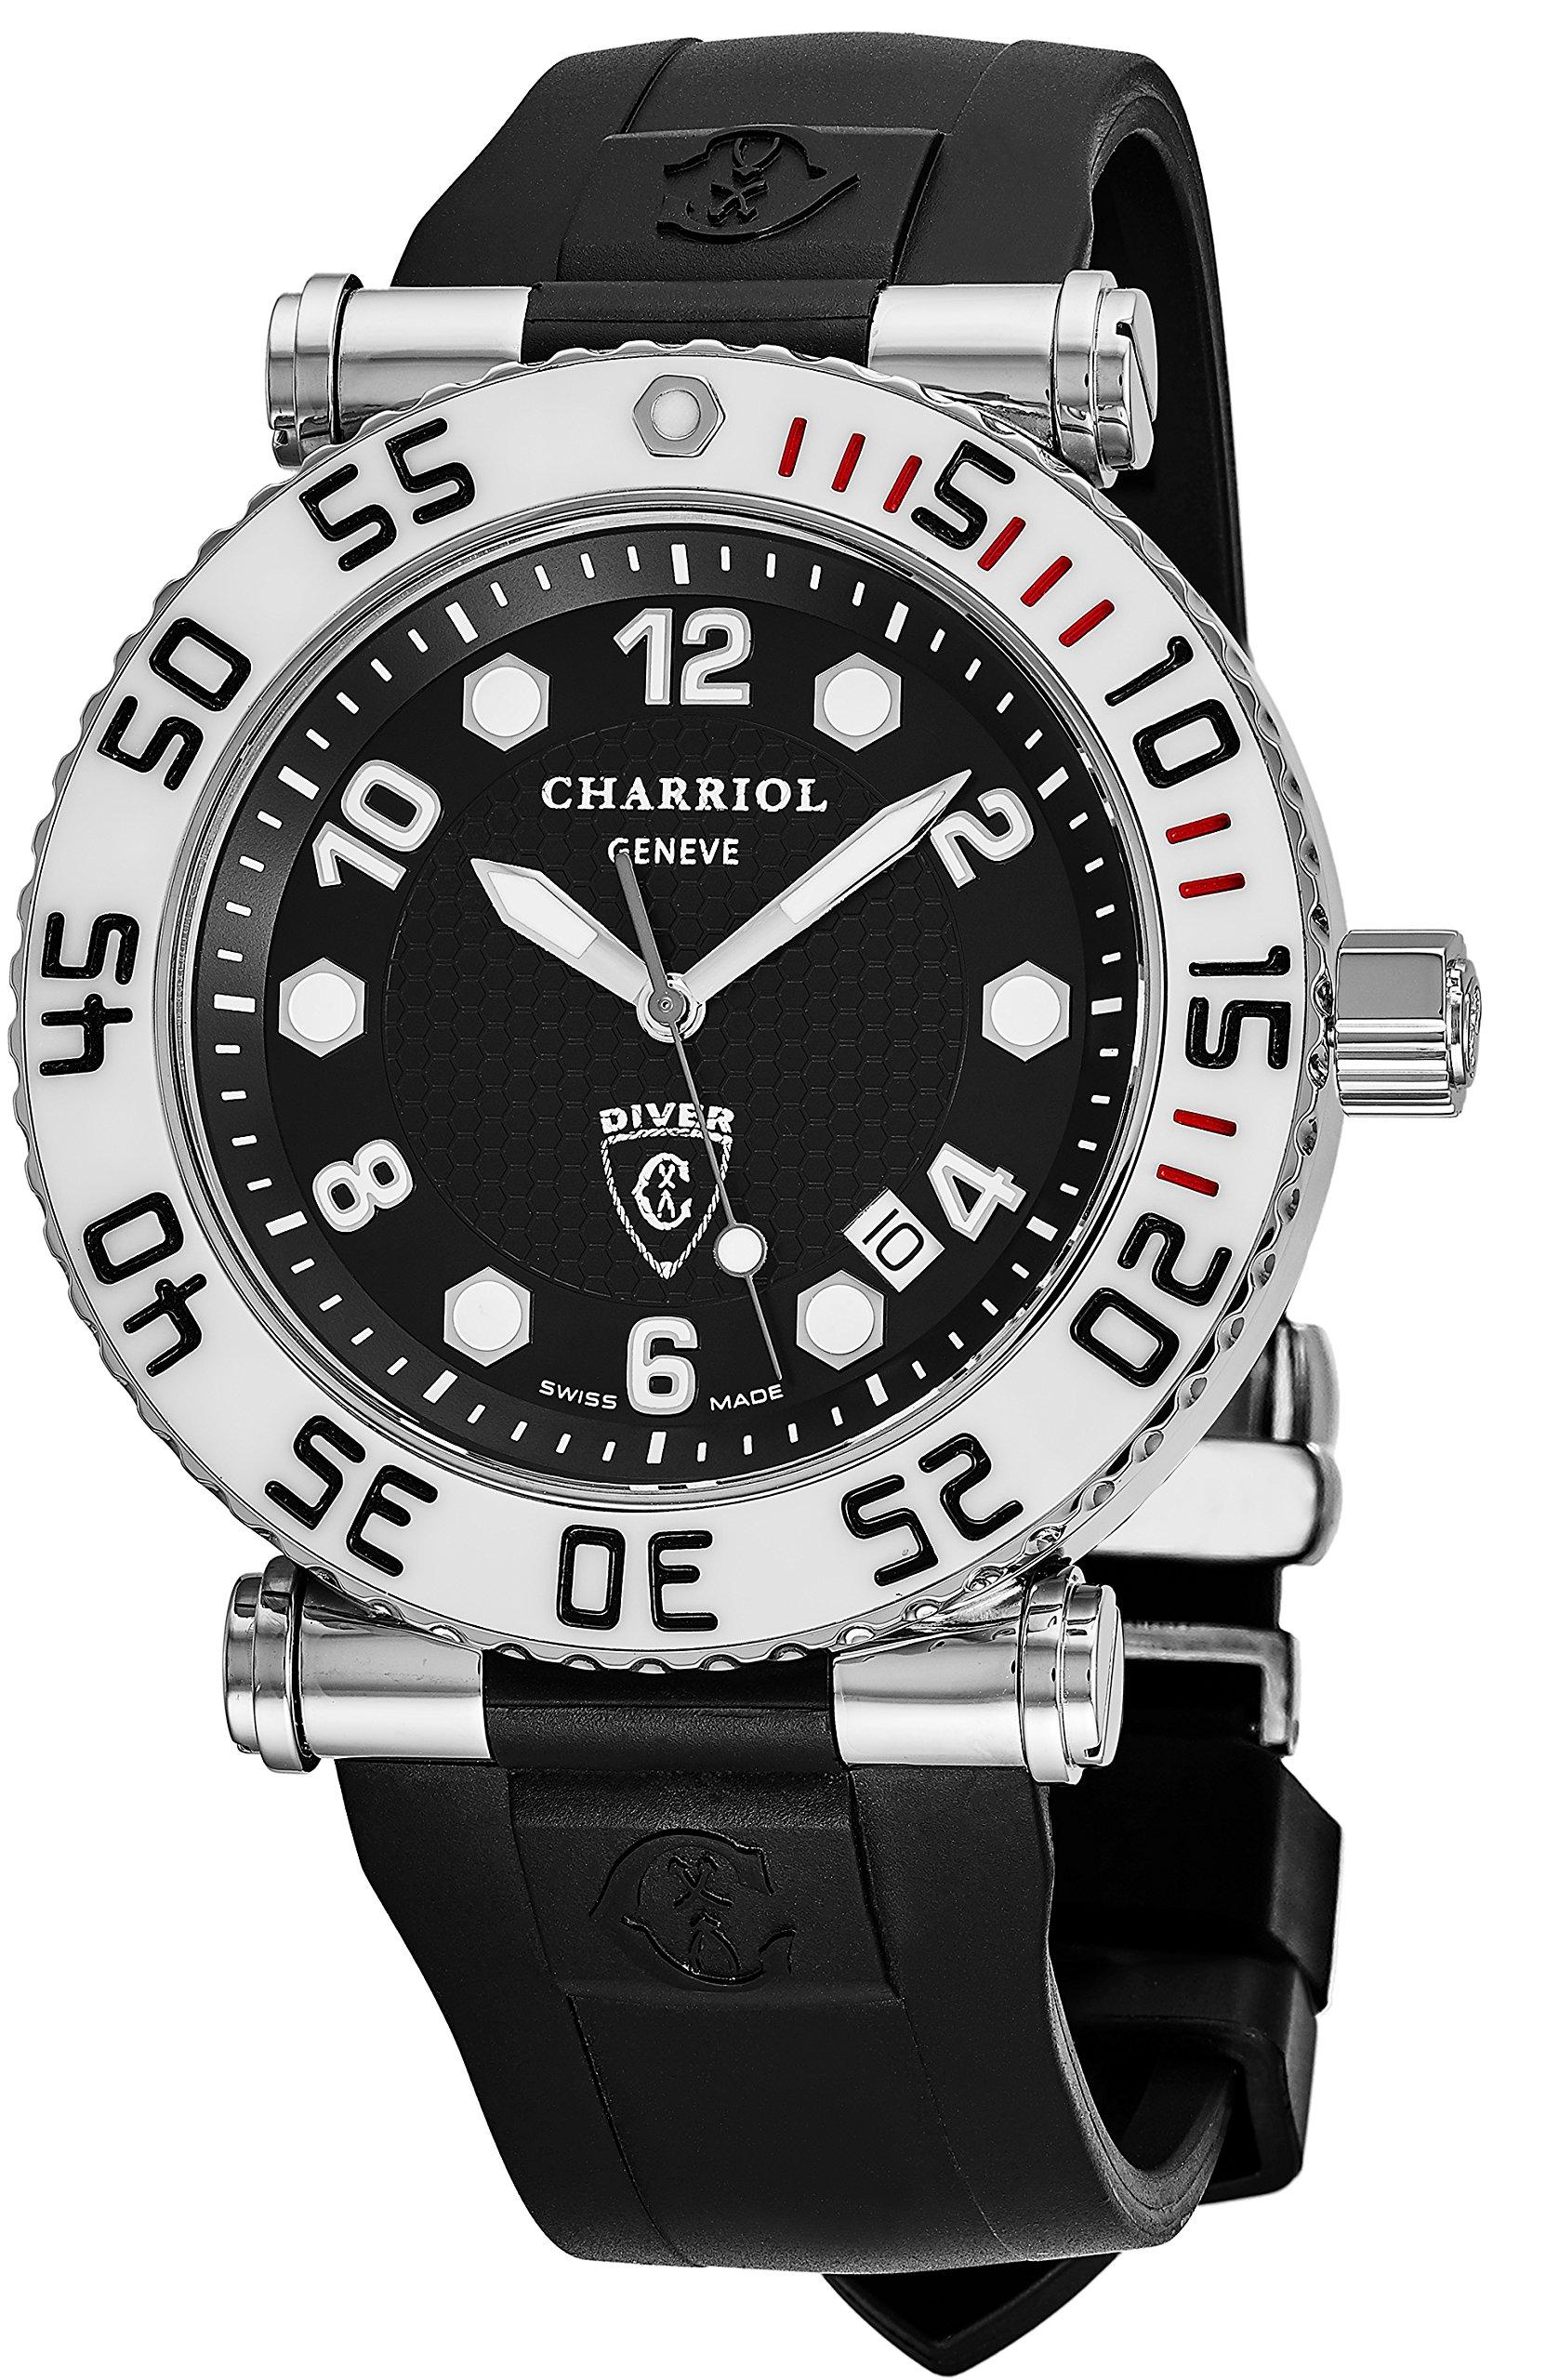 Charriol Rotonde Diver Mens Watch - 42mm Black Face with Luminous Markers Analog Quartz Diving Watch - Black Rubber Strap Swiss Dive Watch For Men 100M Waterproof RT42DIVW.142.D01